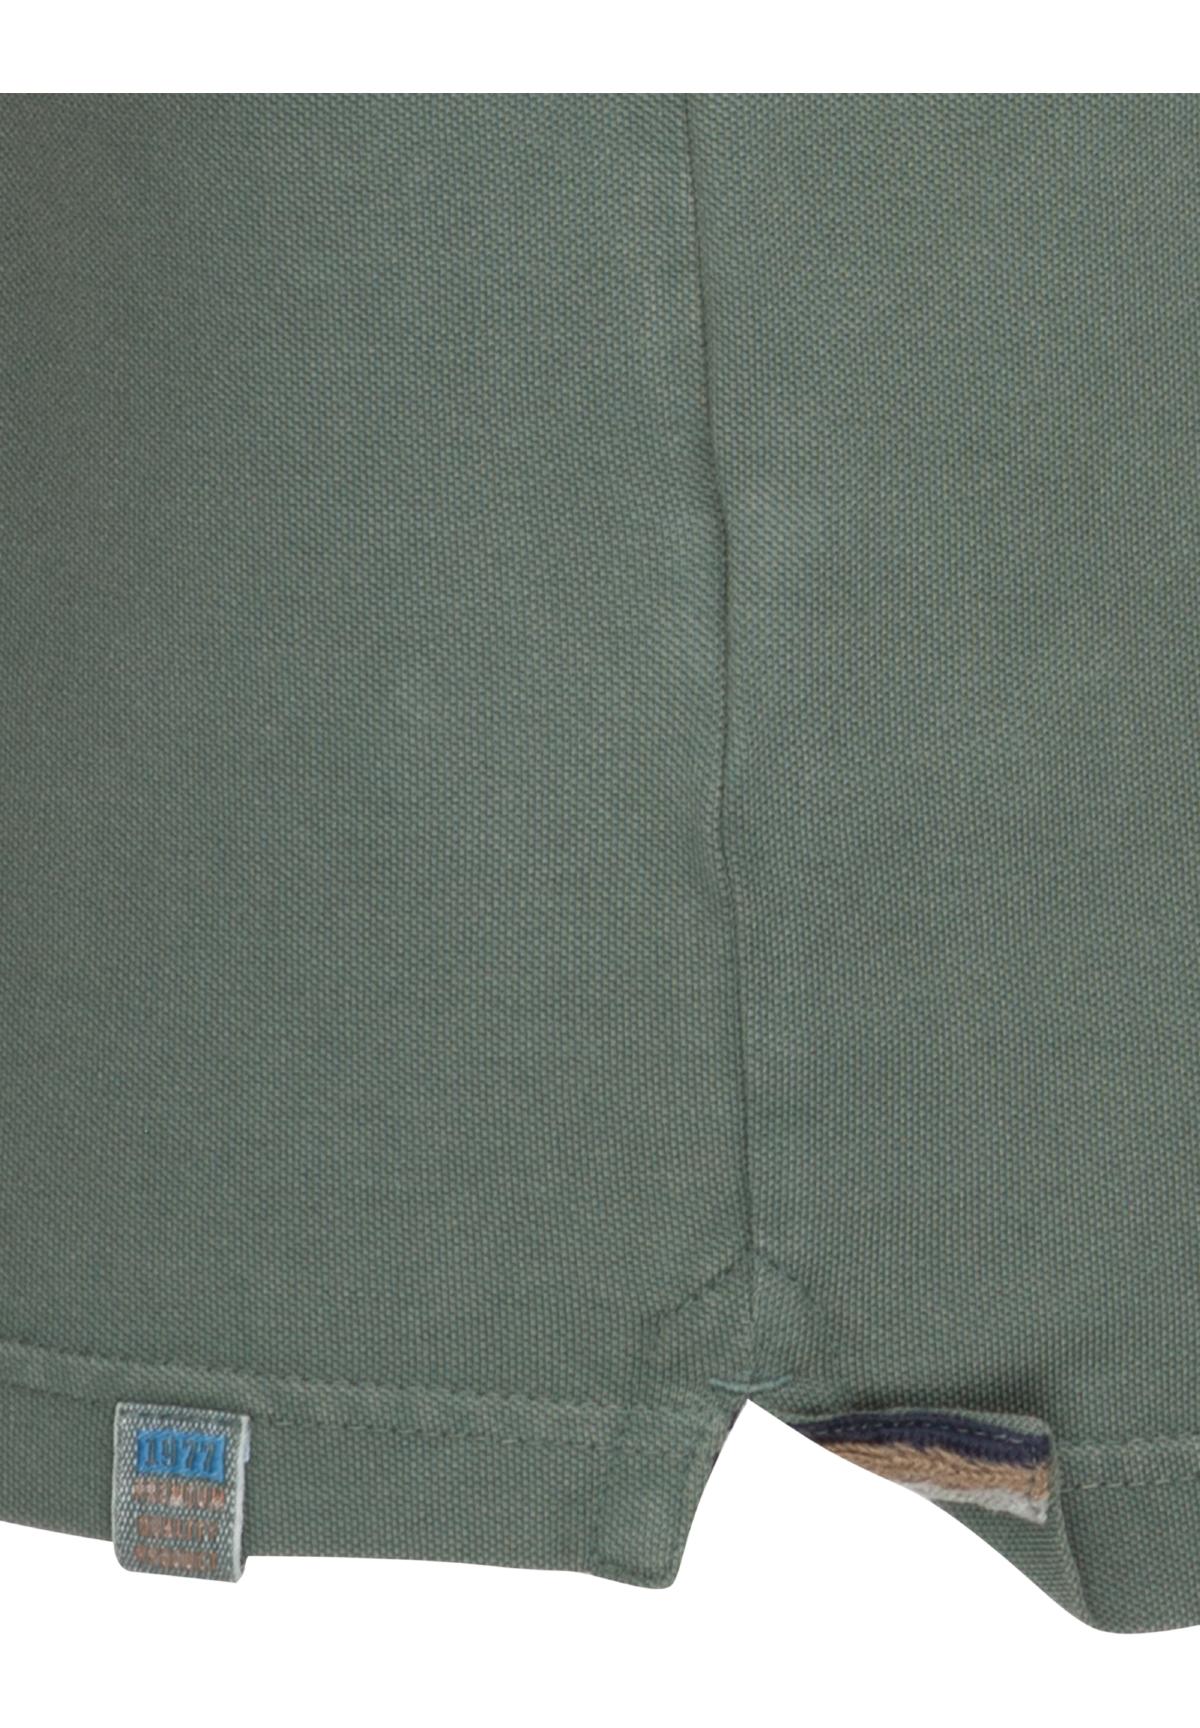 Camel-Active-Herren-Shirt-Poloshirt-Pique-Regular-Fit-NEU Indexbild 84